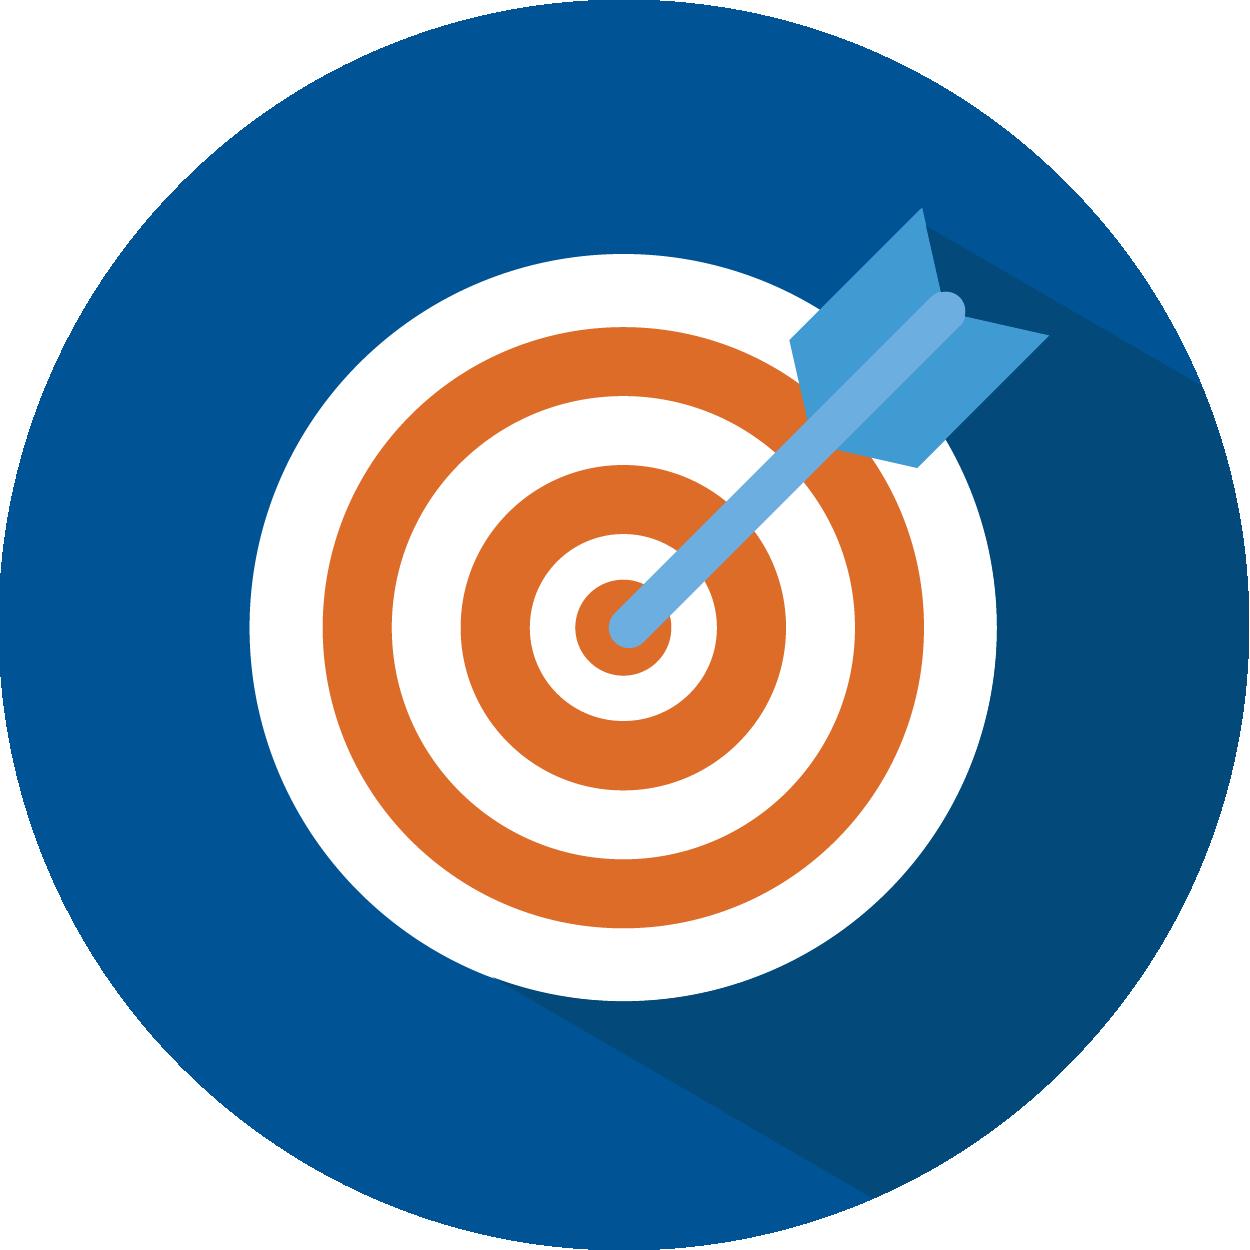 Toolbox team. Vision clipart visionary leadership